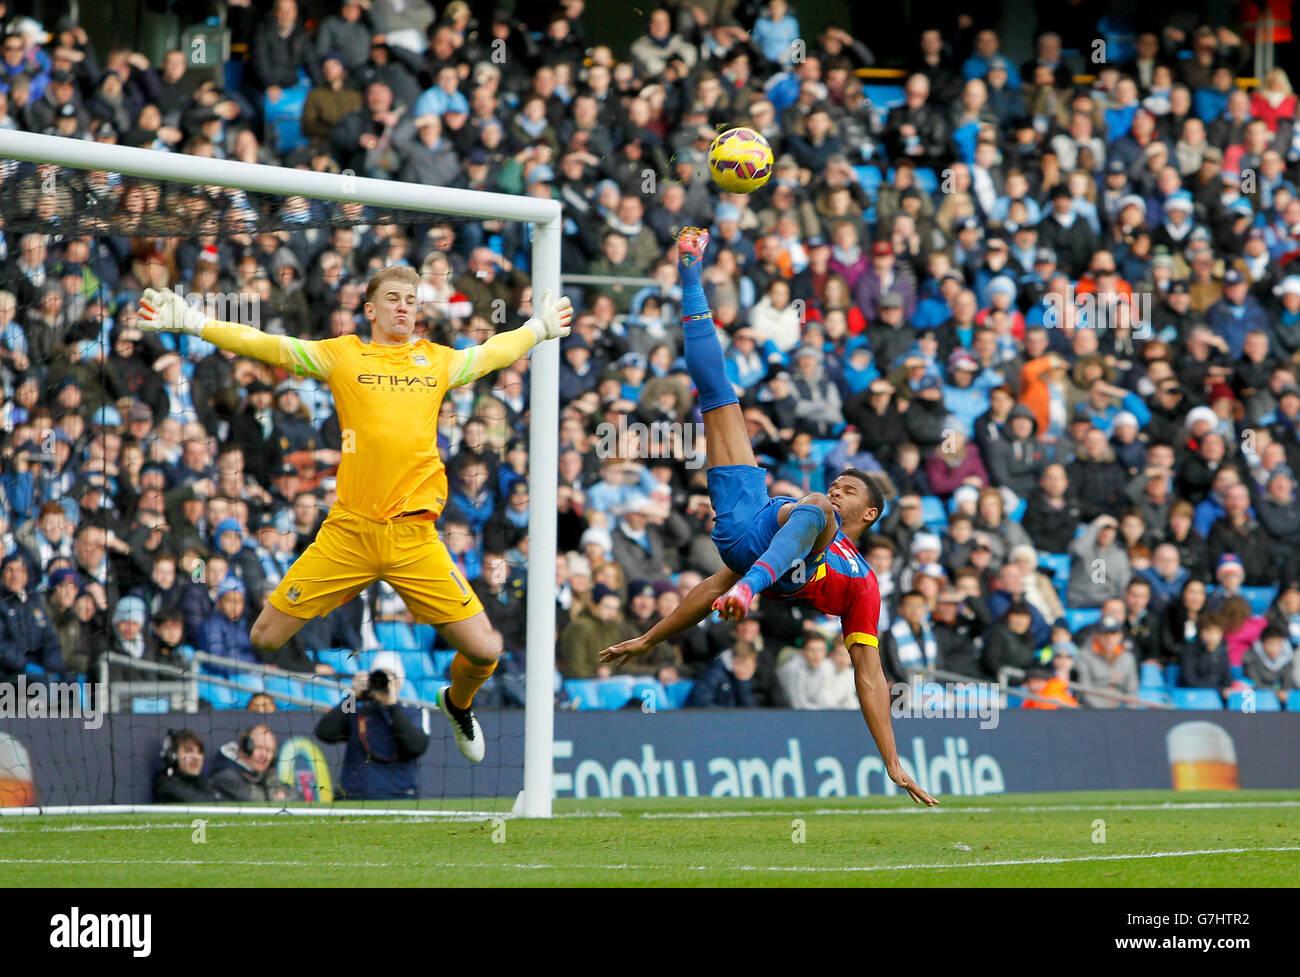 Soccer - Barclays Premier League - Manchester City v Crystal Palace - Etihad Stadium - Stock Image